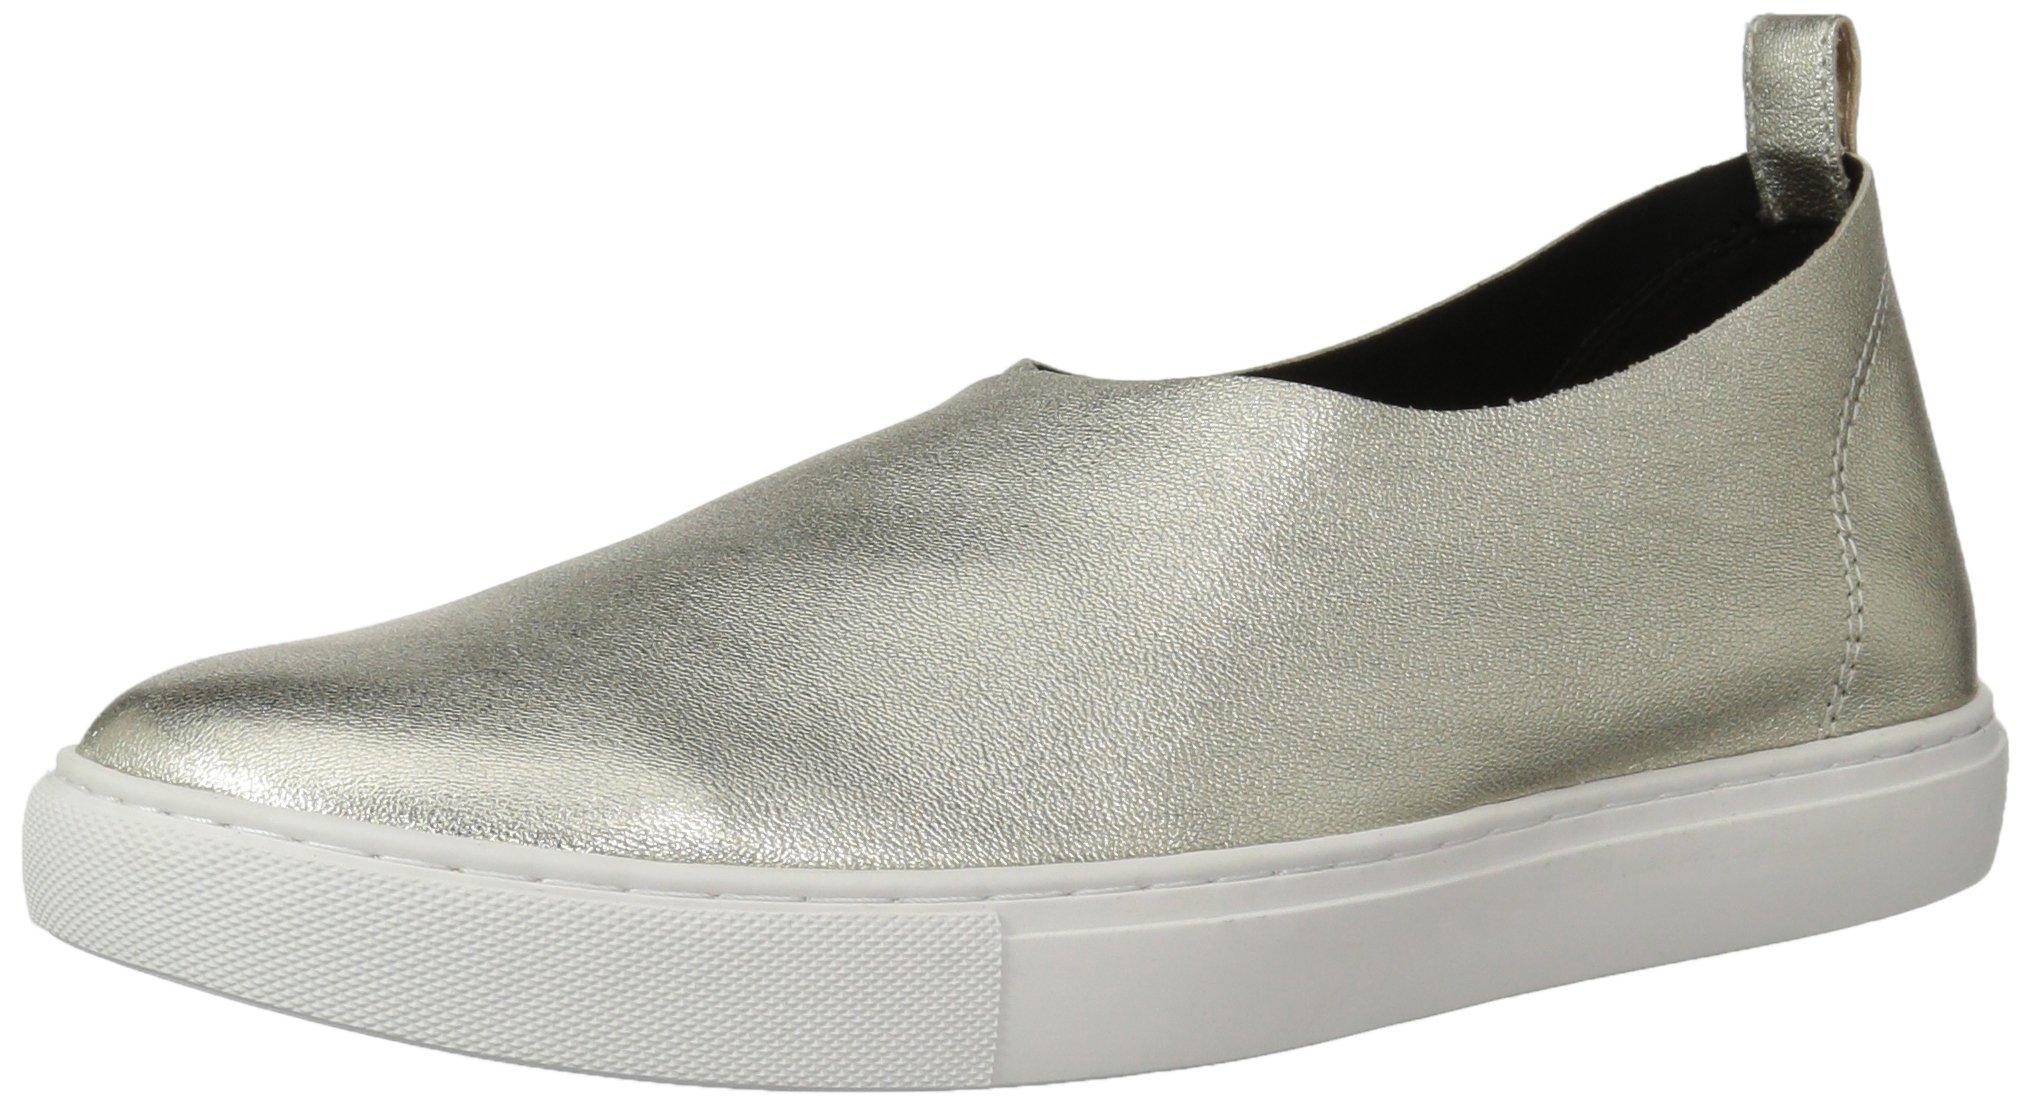 Kenneth Cole New York Women's Kathy Slip Stretch Upper Sneaker, Light Gold, 6.5 Medium US